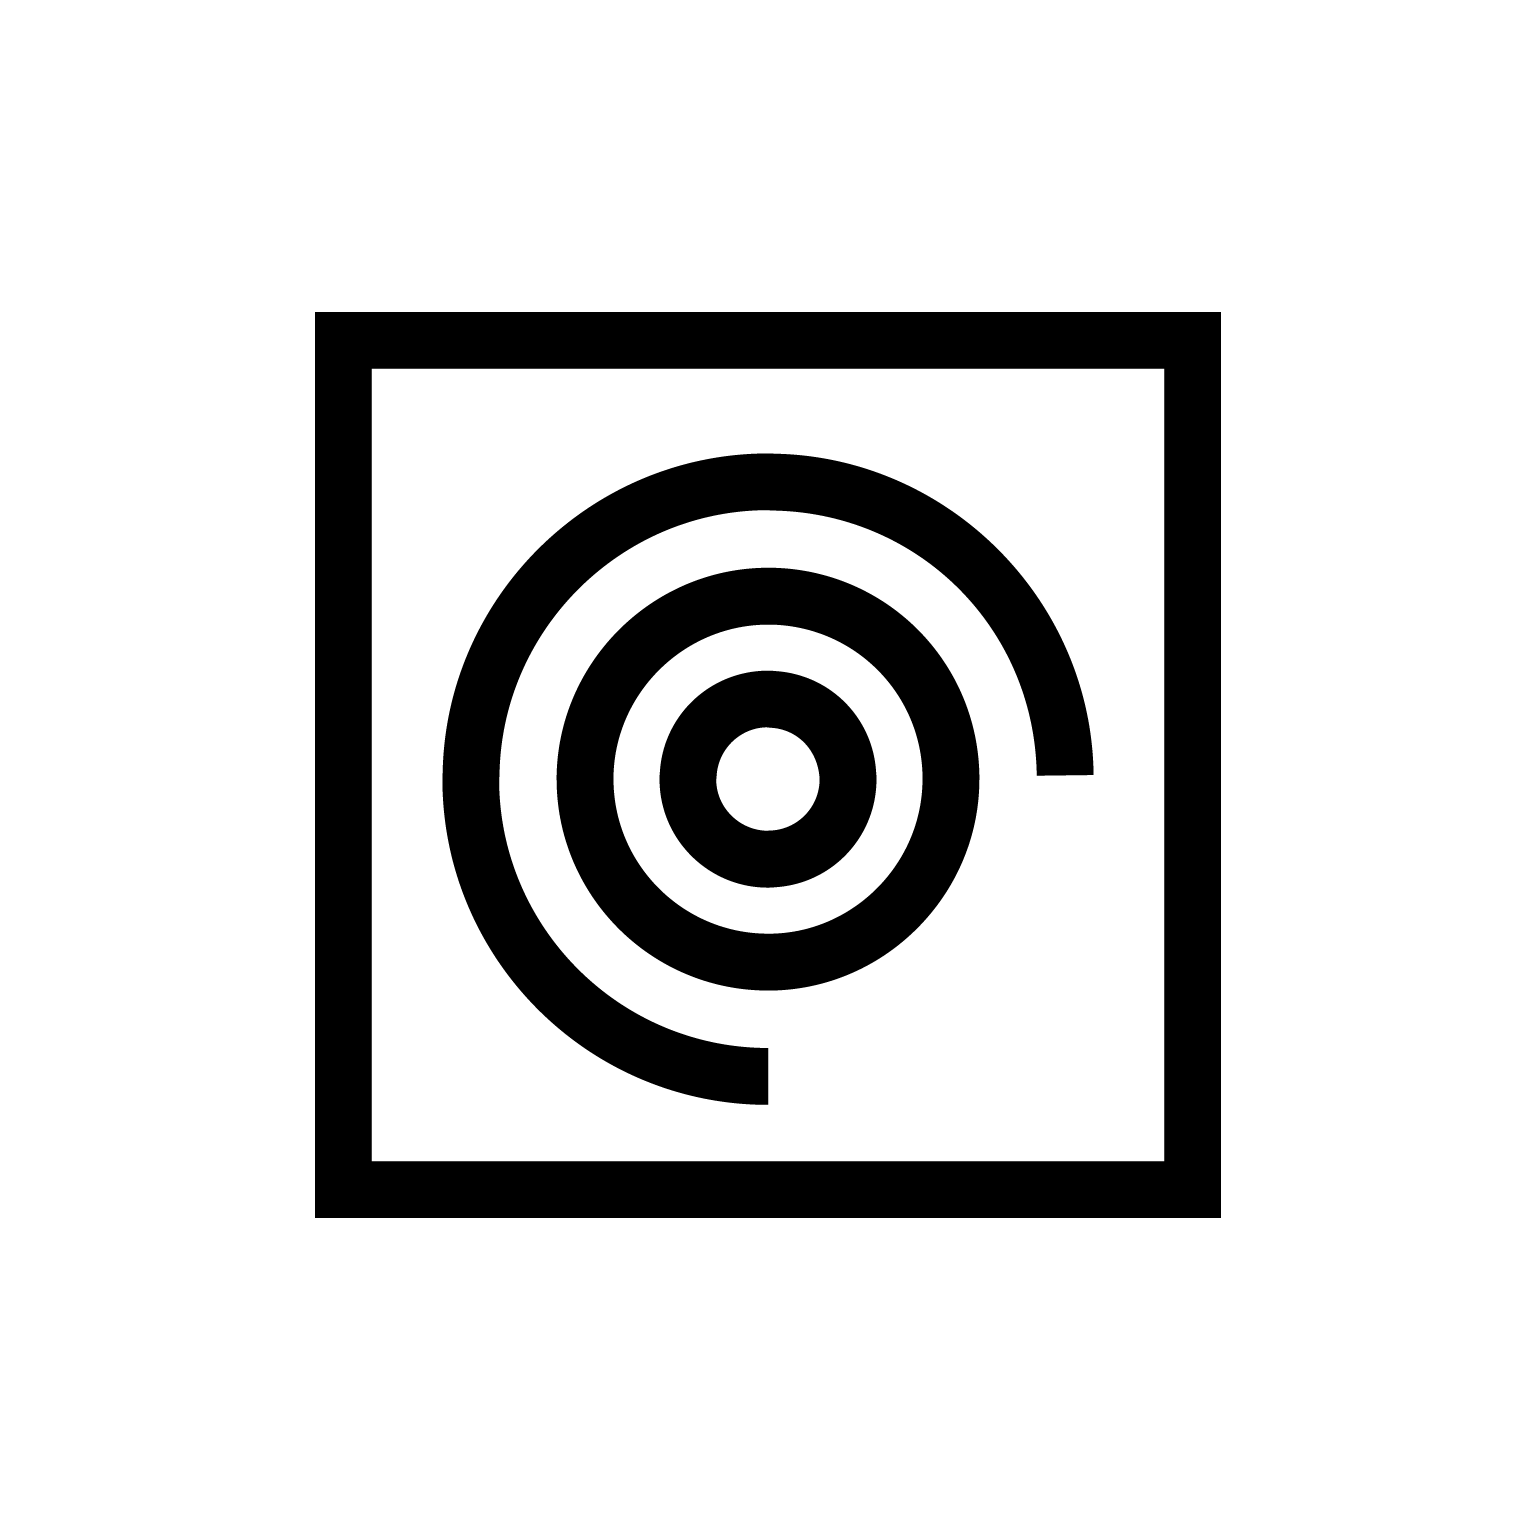 Encoder Strip